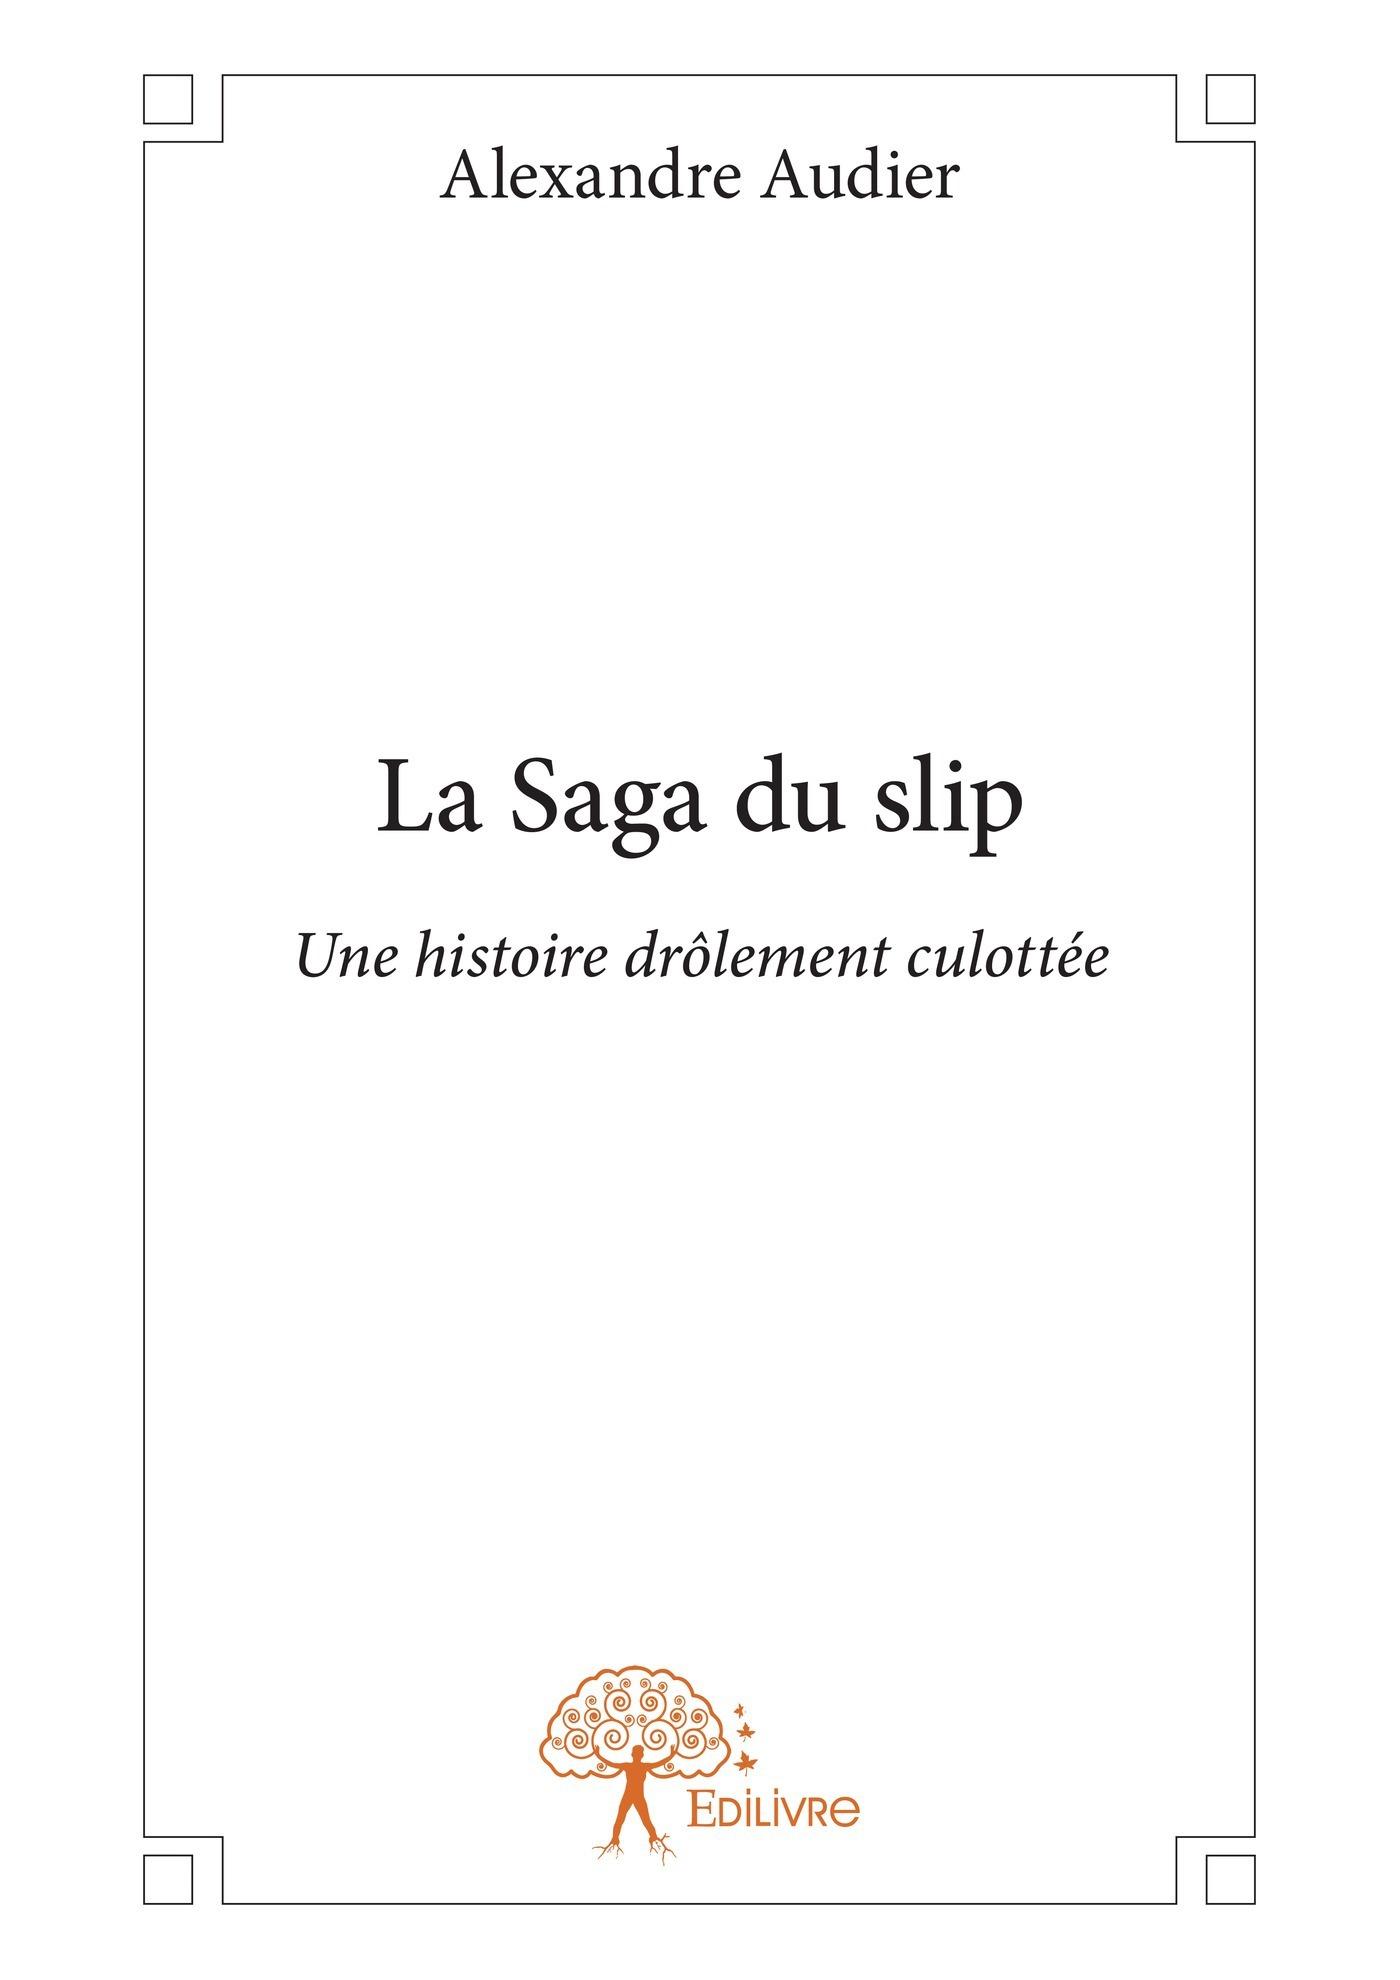 Alexandre Audier La Saga du slip